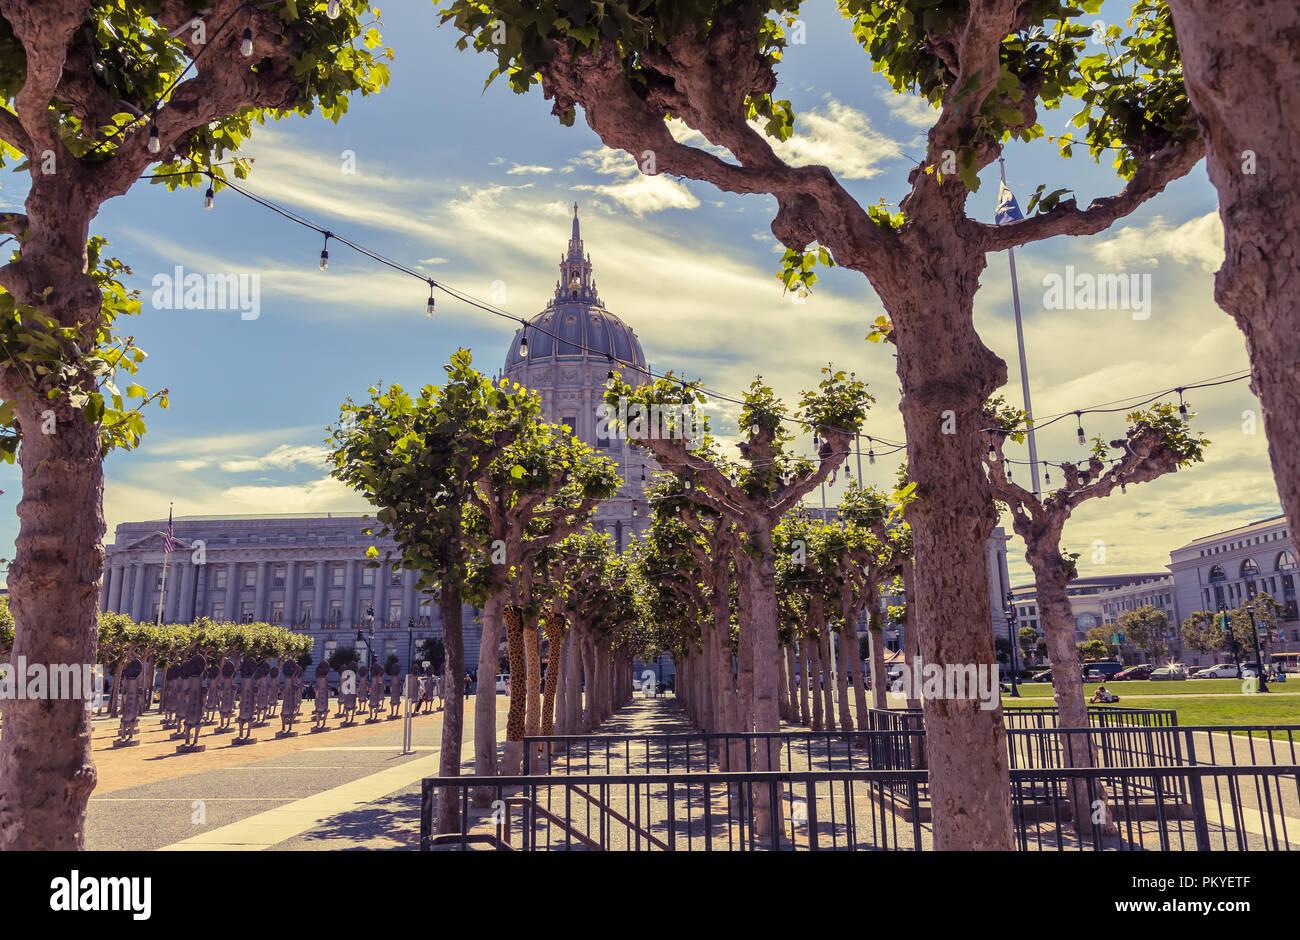 PlantFiles Pictures: Platanus, London Planetree, Plane ...  San Francisco City Hall Trees